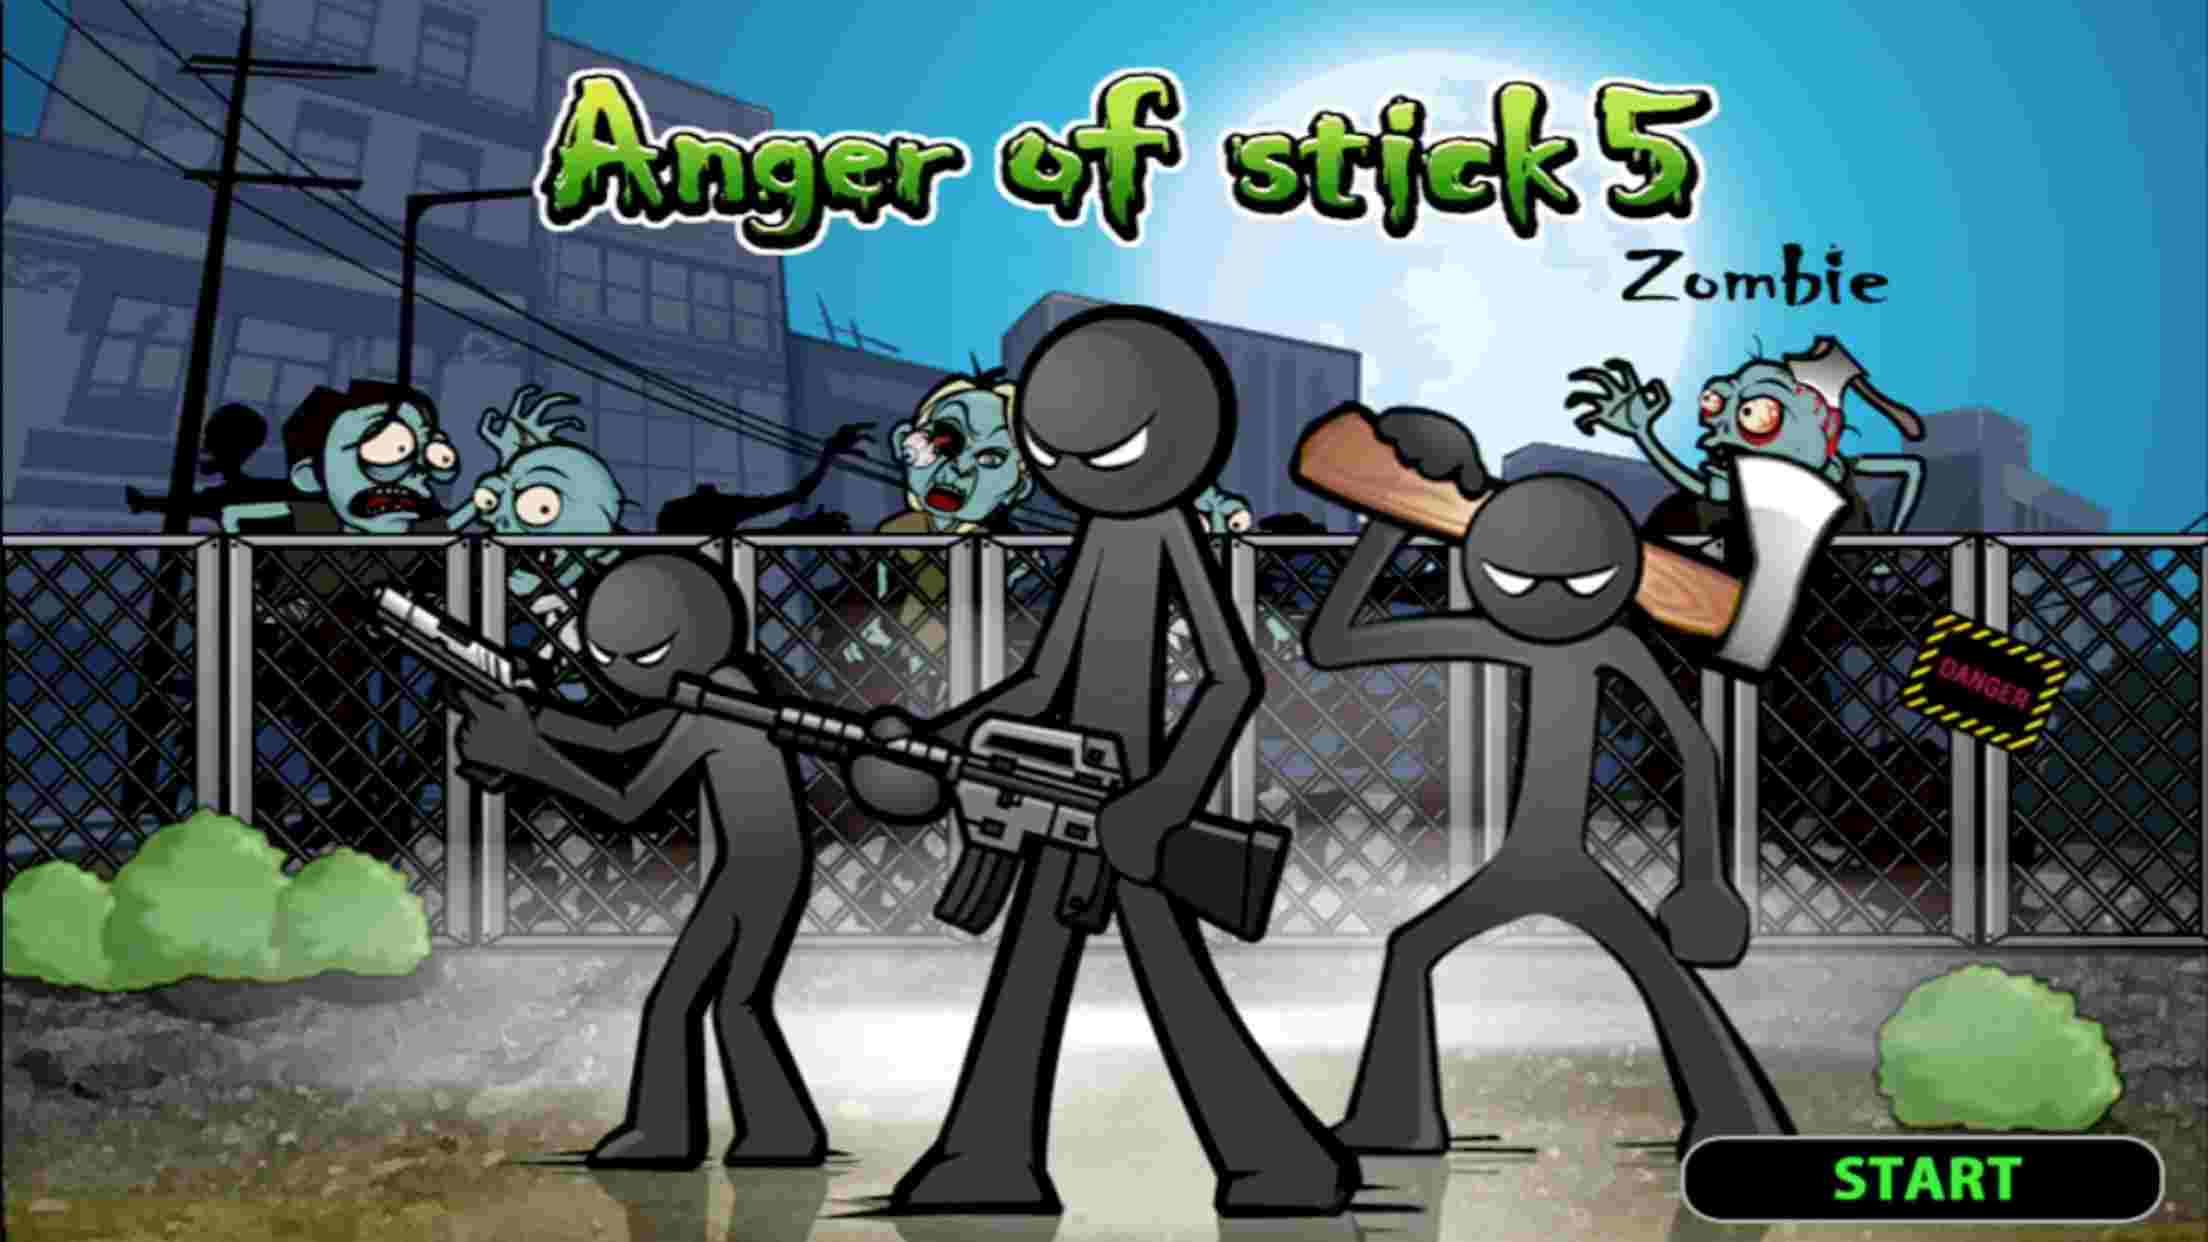 Anger of stick 5 hack